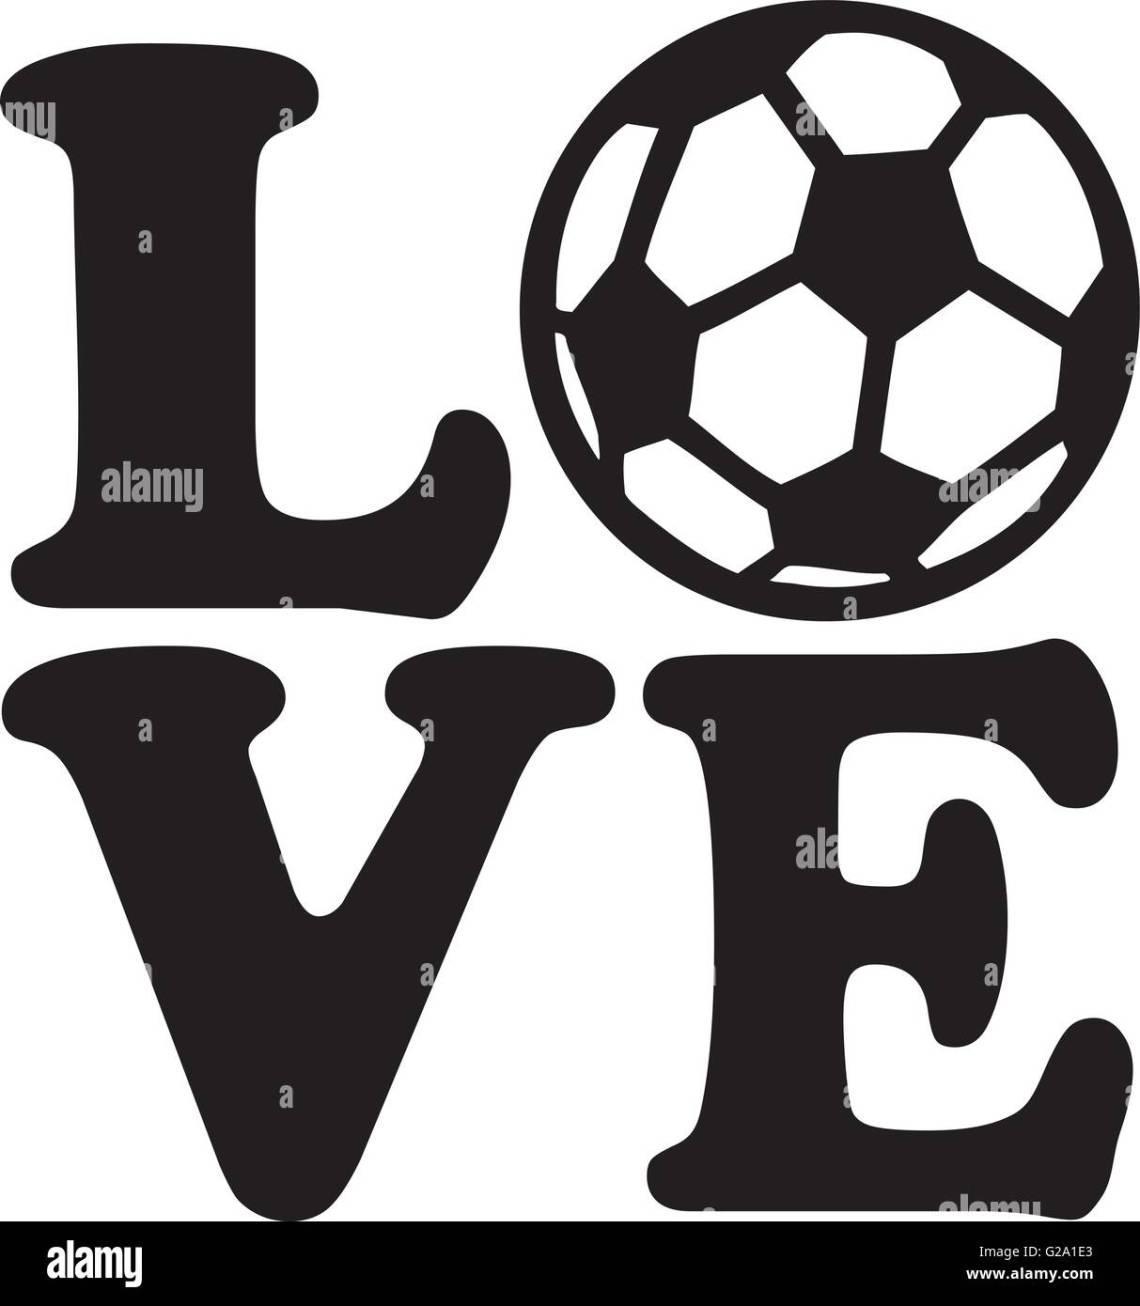 Download Soccer Love Stock Vector Art & Illustration, Vector Image ...